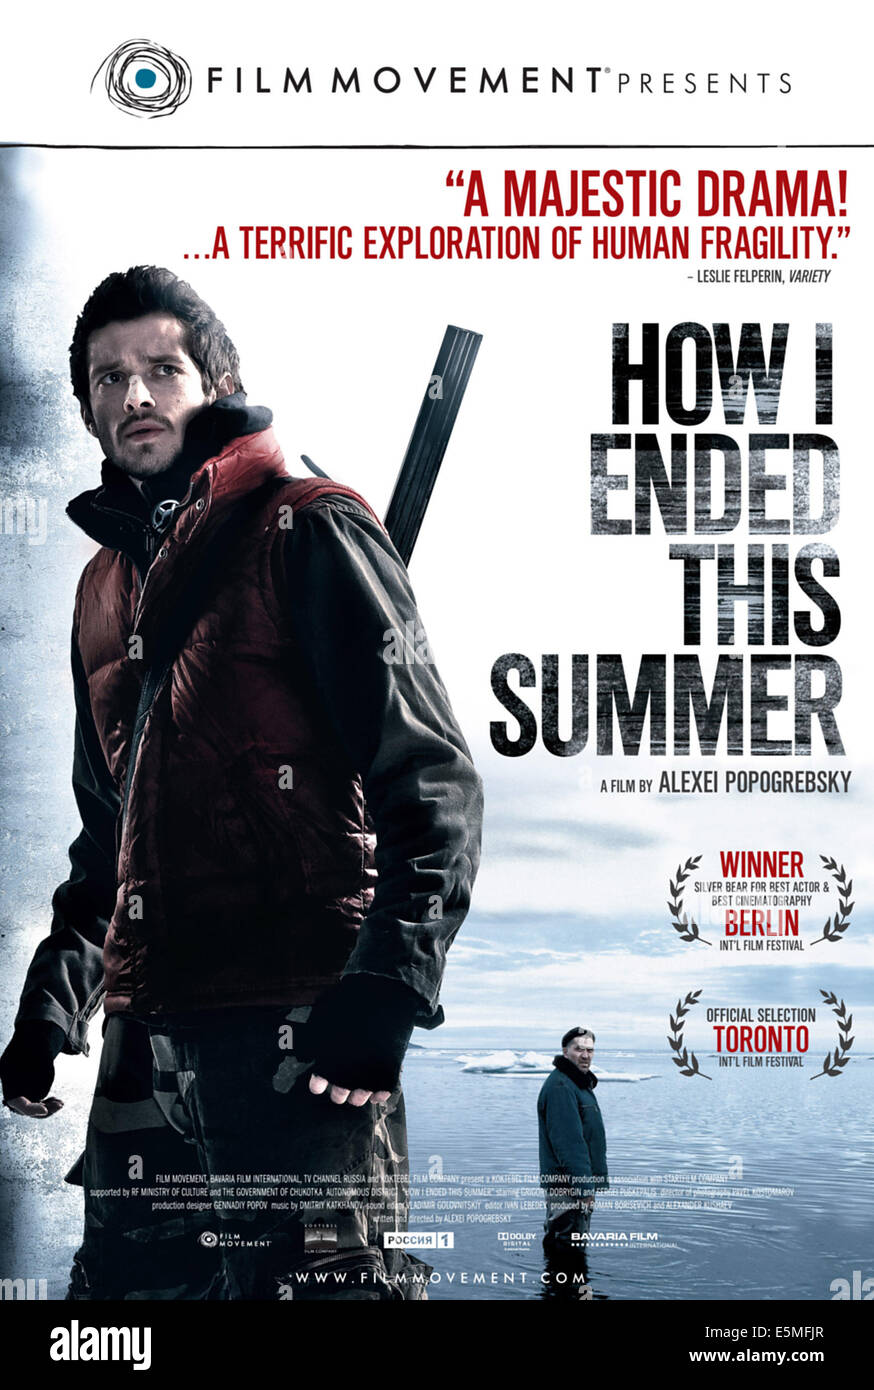 HOW I ENDED THIS SUMMER, (aka KAK YA PROVYOL ETIM LETOM), l-r: Grigory Dobrygin, Sergei Puskepalis on poster art, - Stock Image